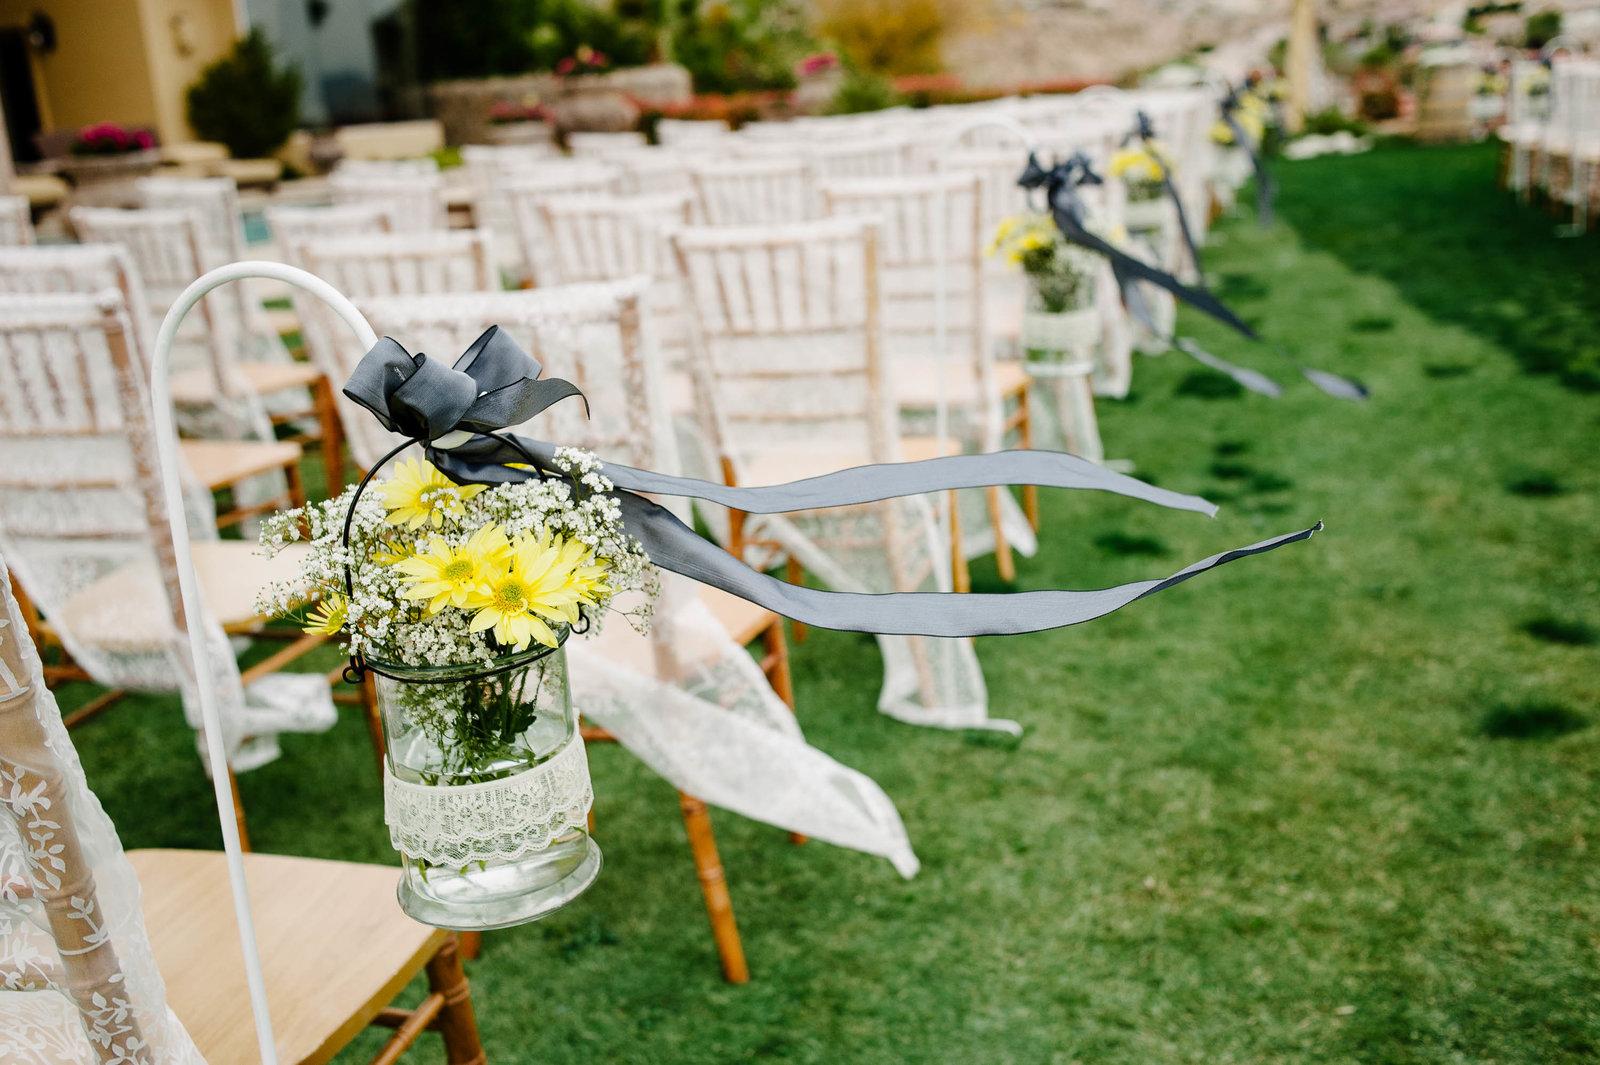 119-El-paso-wedding-photographer-El Paso Wedding Photographer_D34